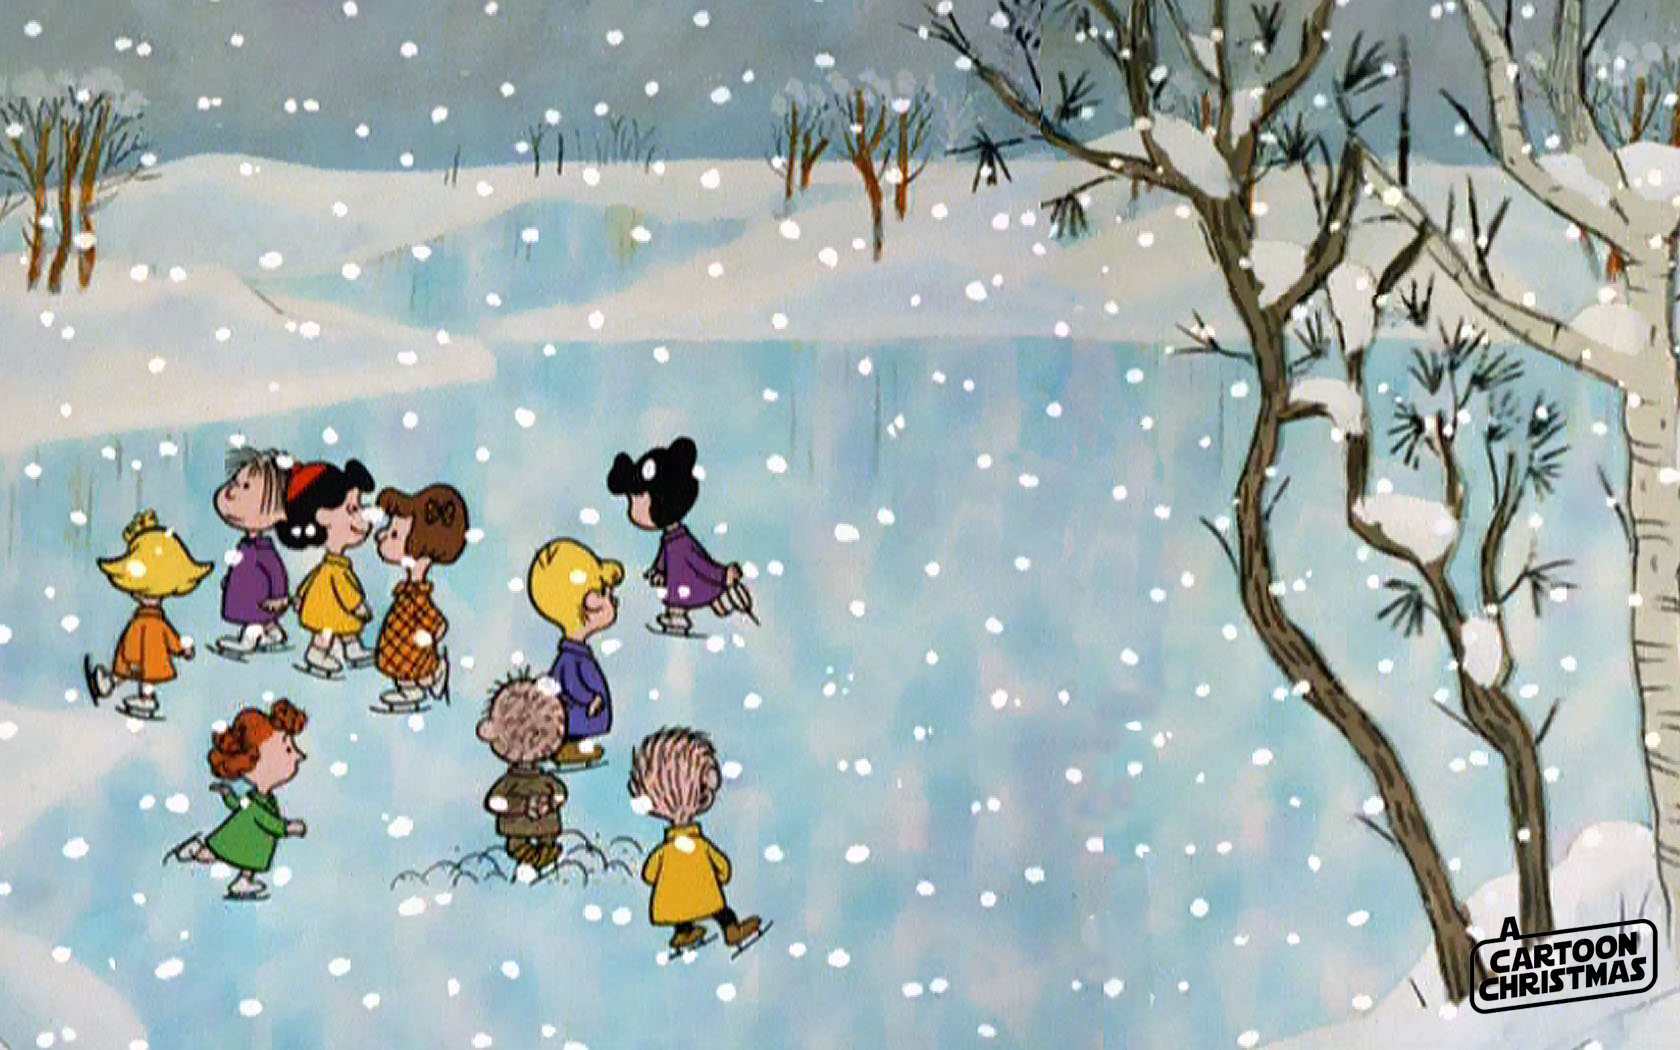 peanuts christmas wallpaper 1080p - photo #10